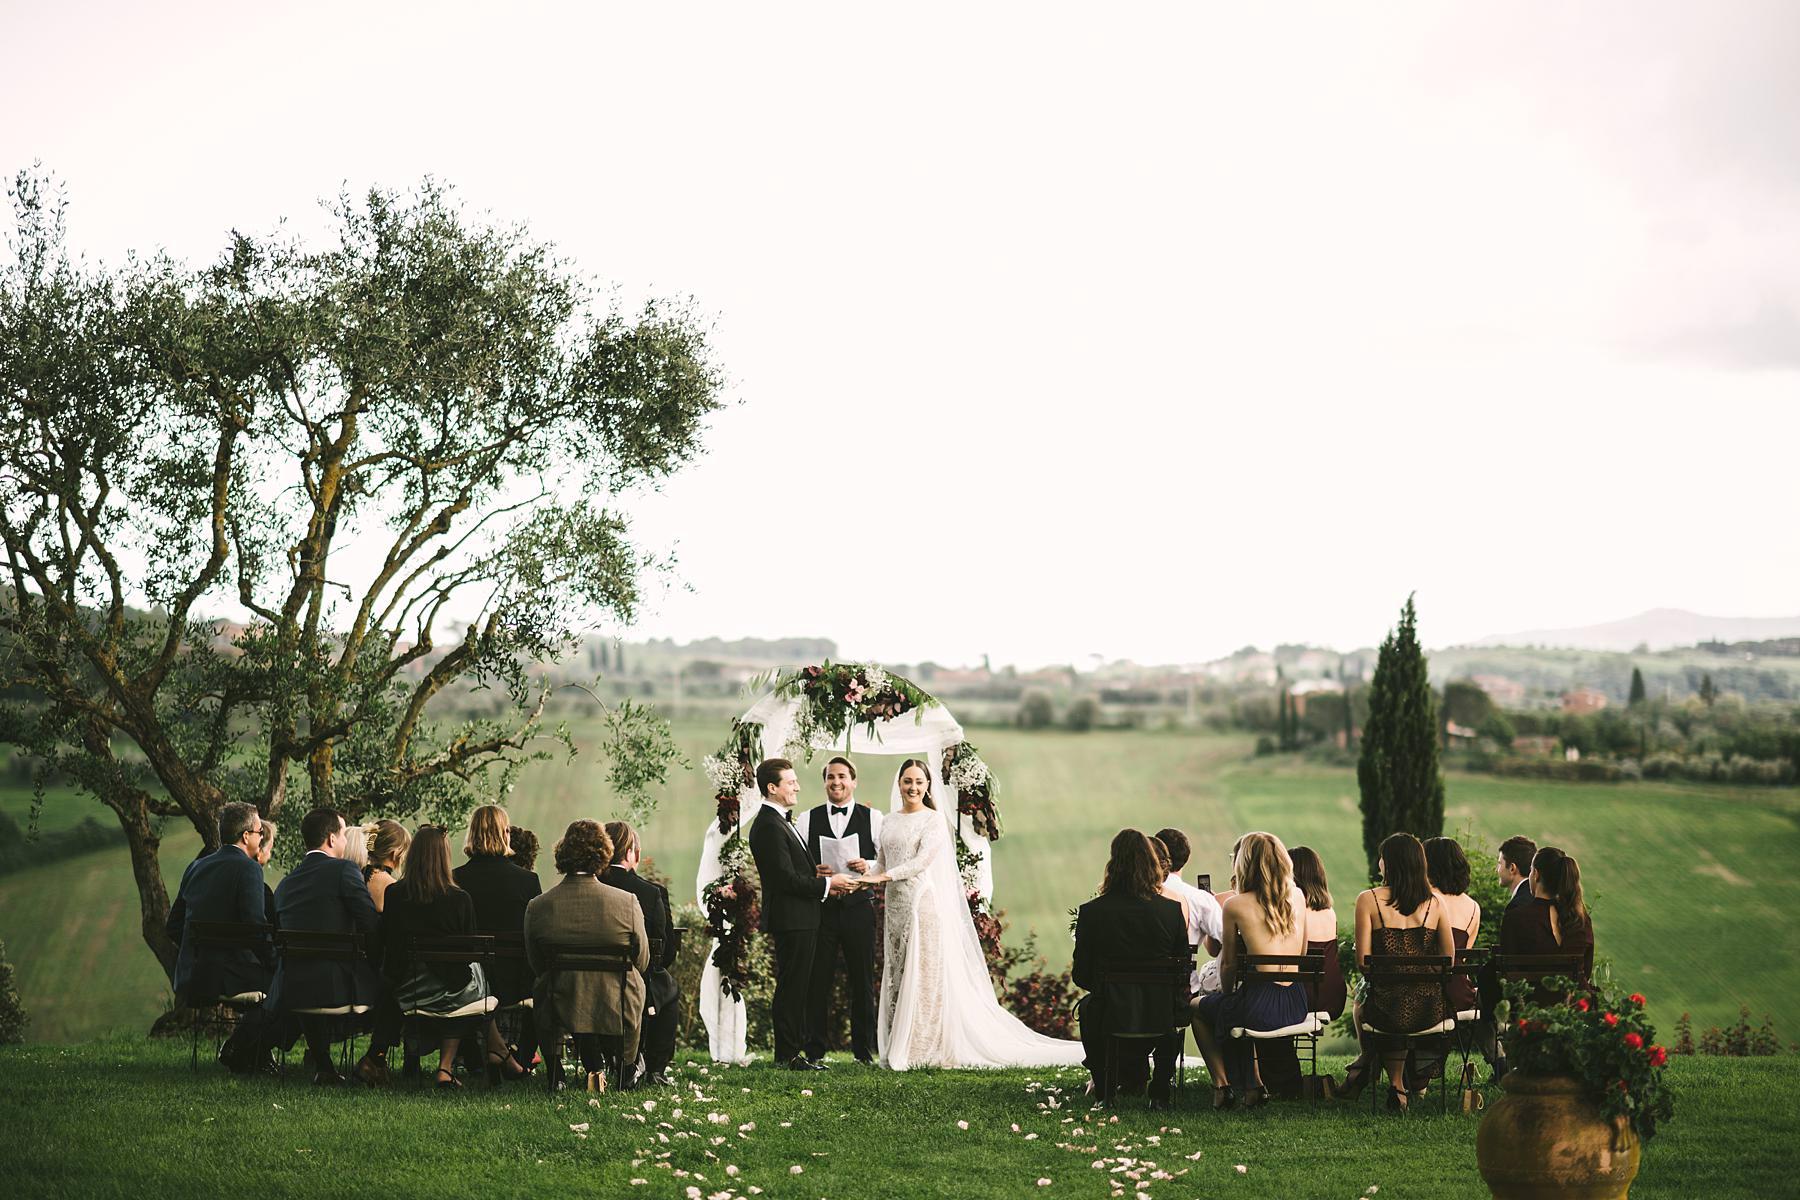 Elegant intimate destination outdoor symbolic wedding with amazing landscape in Umbria countryside at incredible historic venue Villa l'Antica Posta